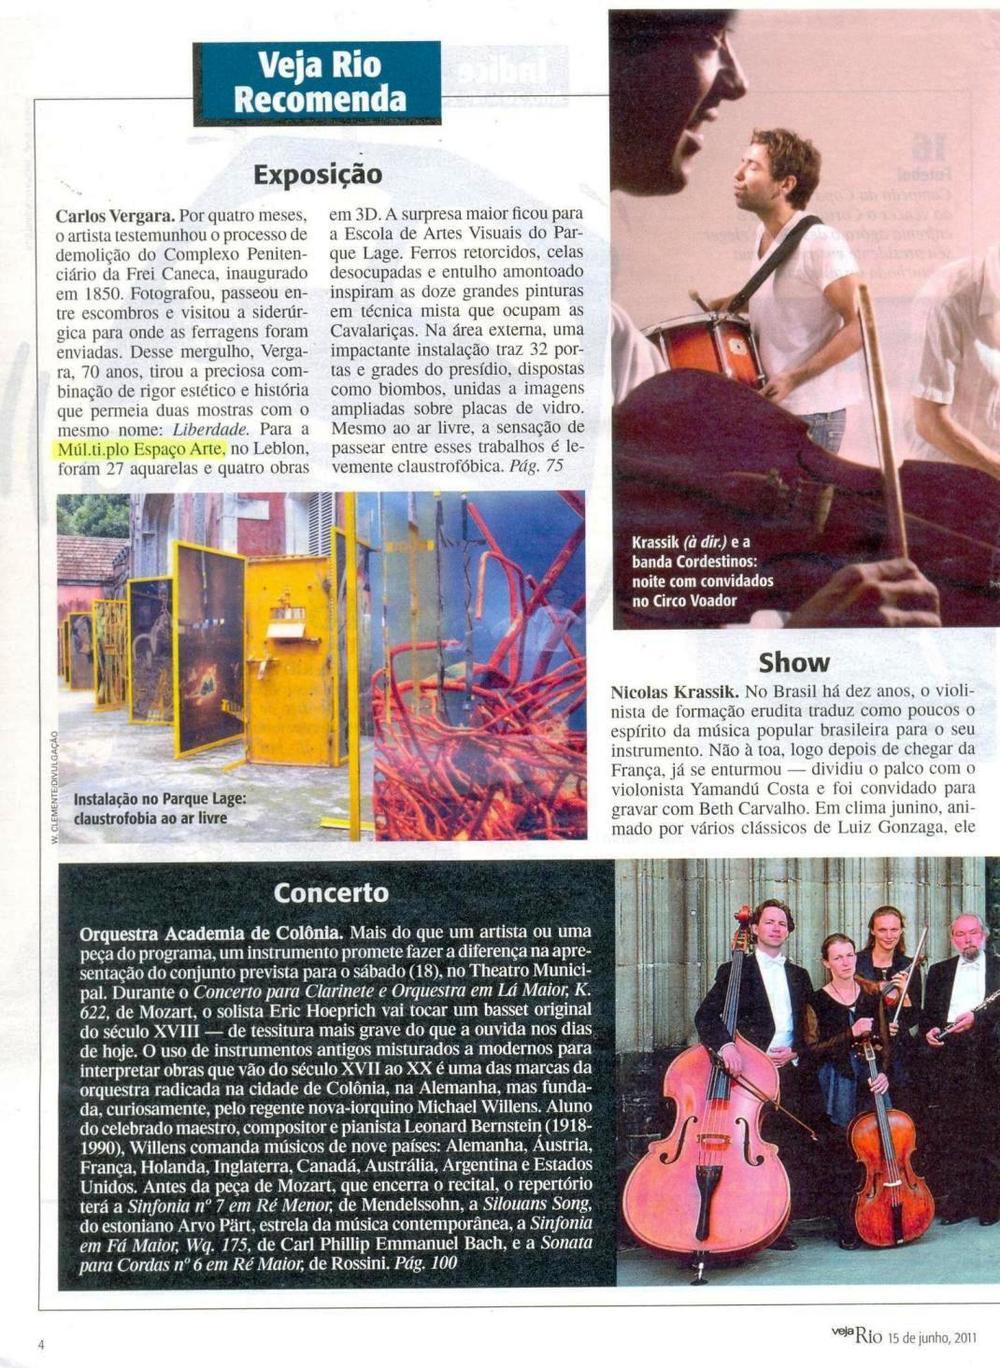 MUL.TI.PLO ESPAÇO ARTE 15.06.2011.jpg